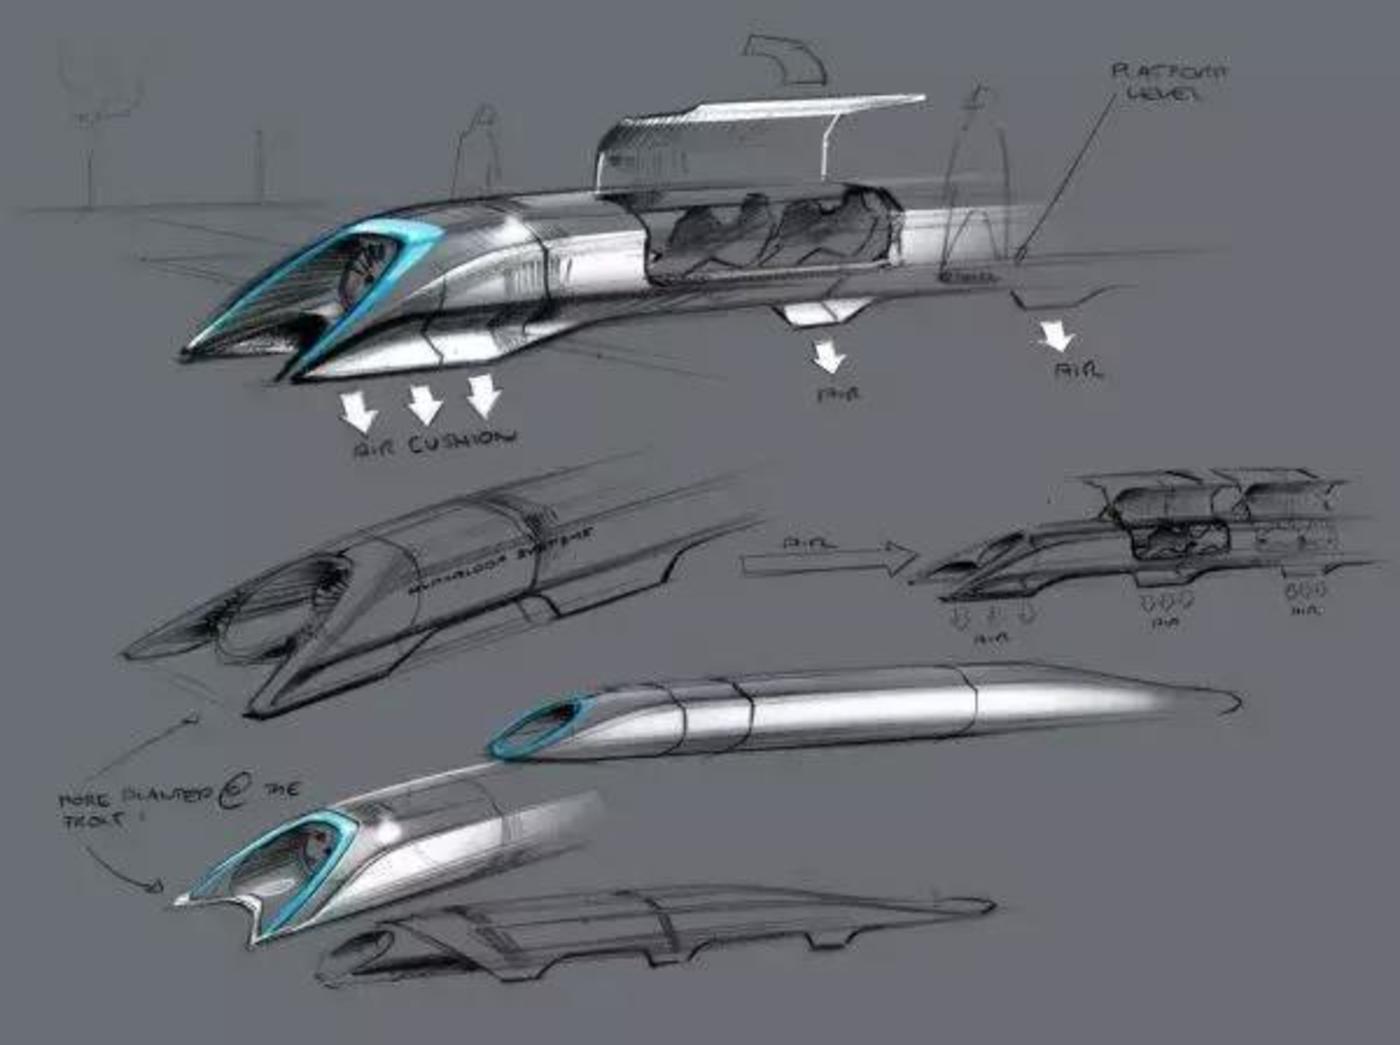 Elon Musk 的设计草稿